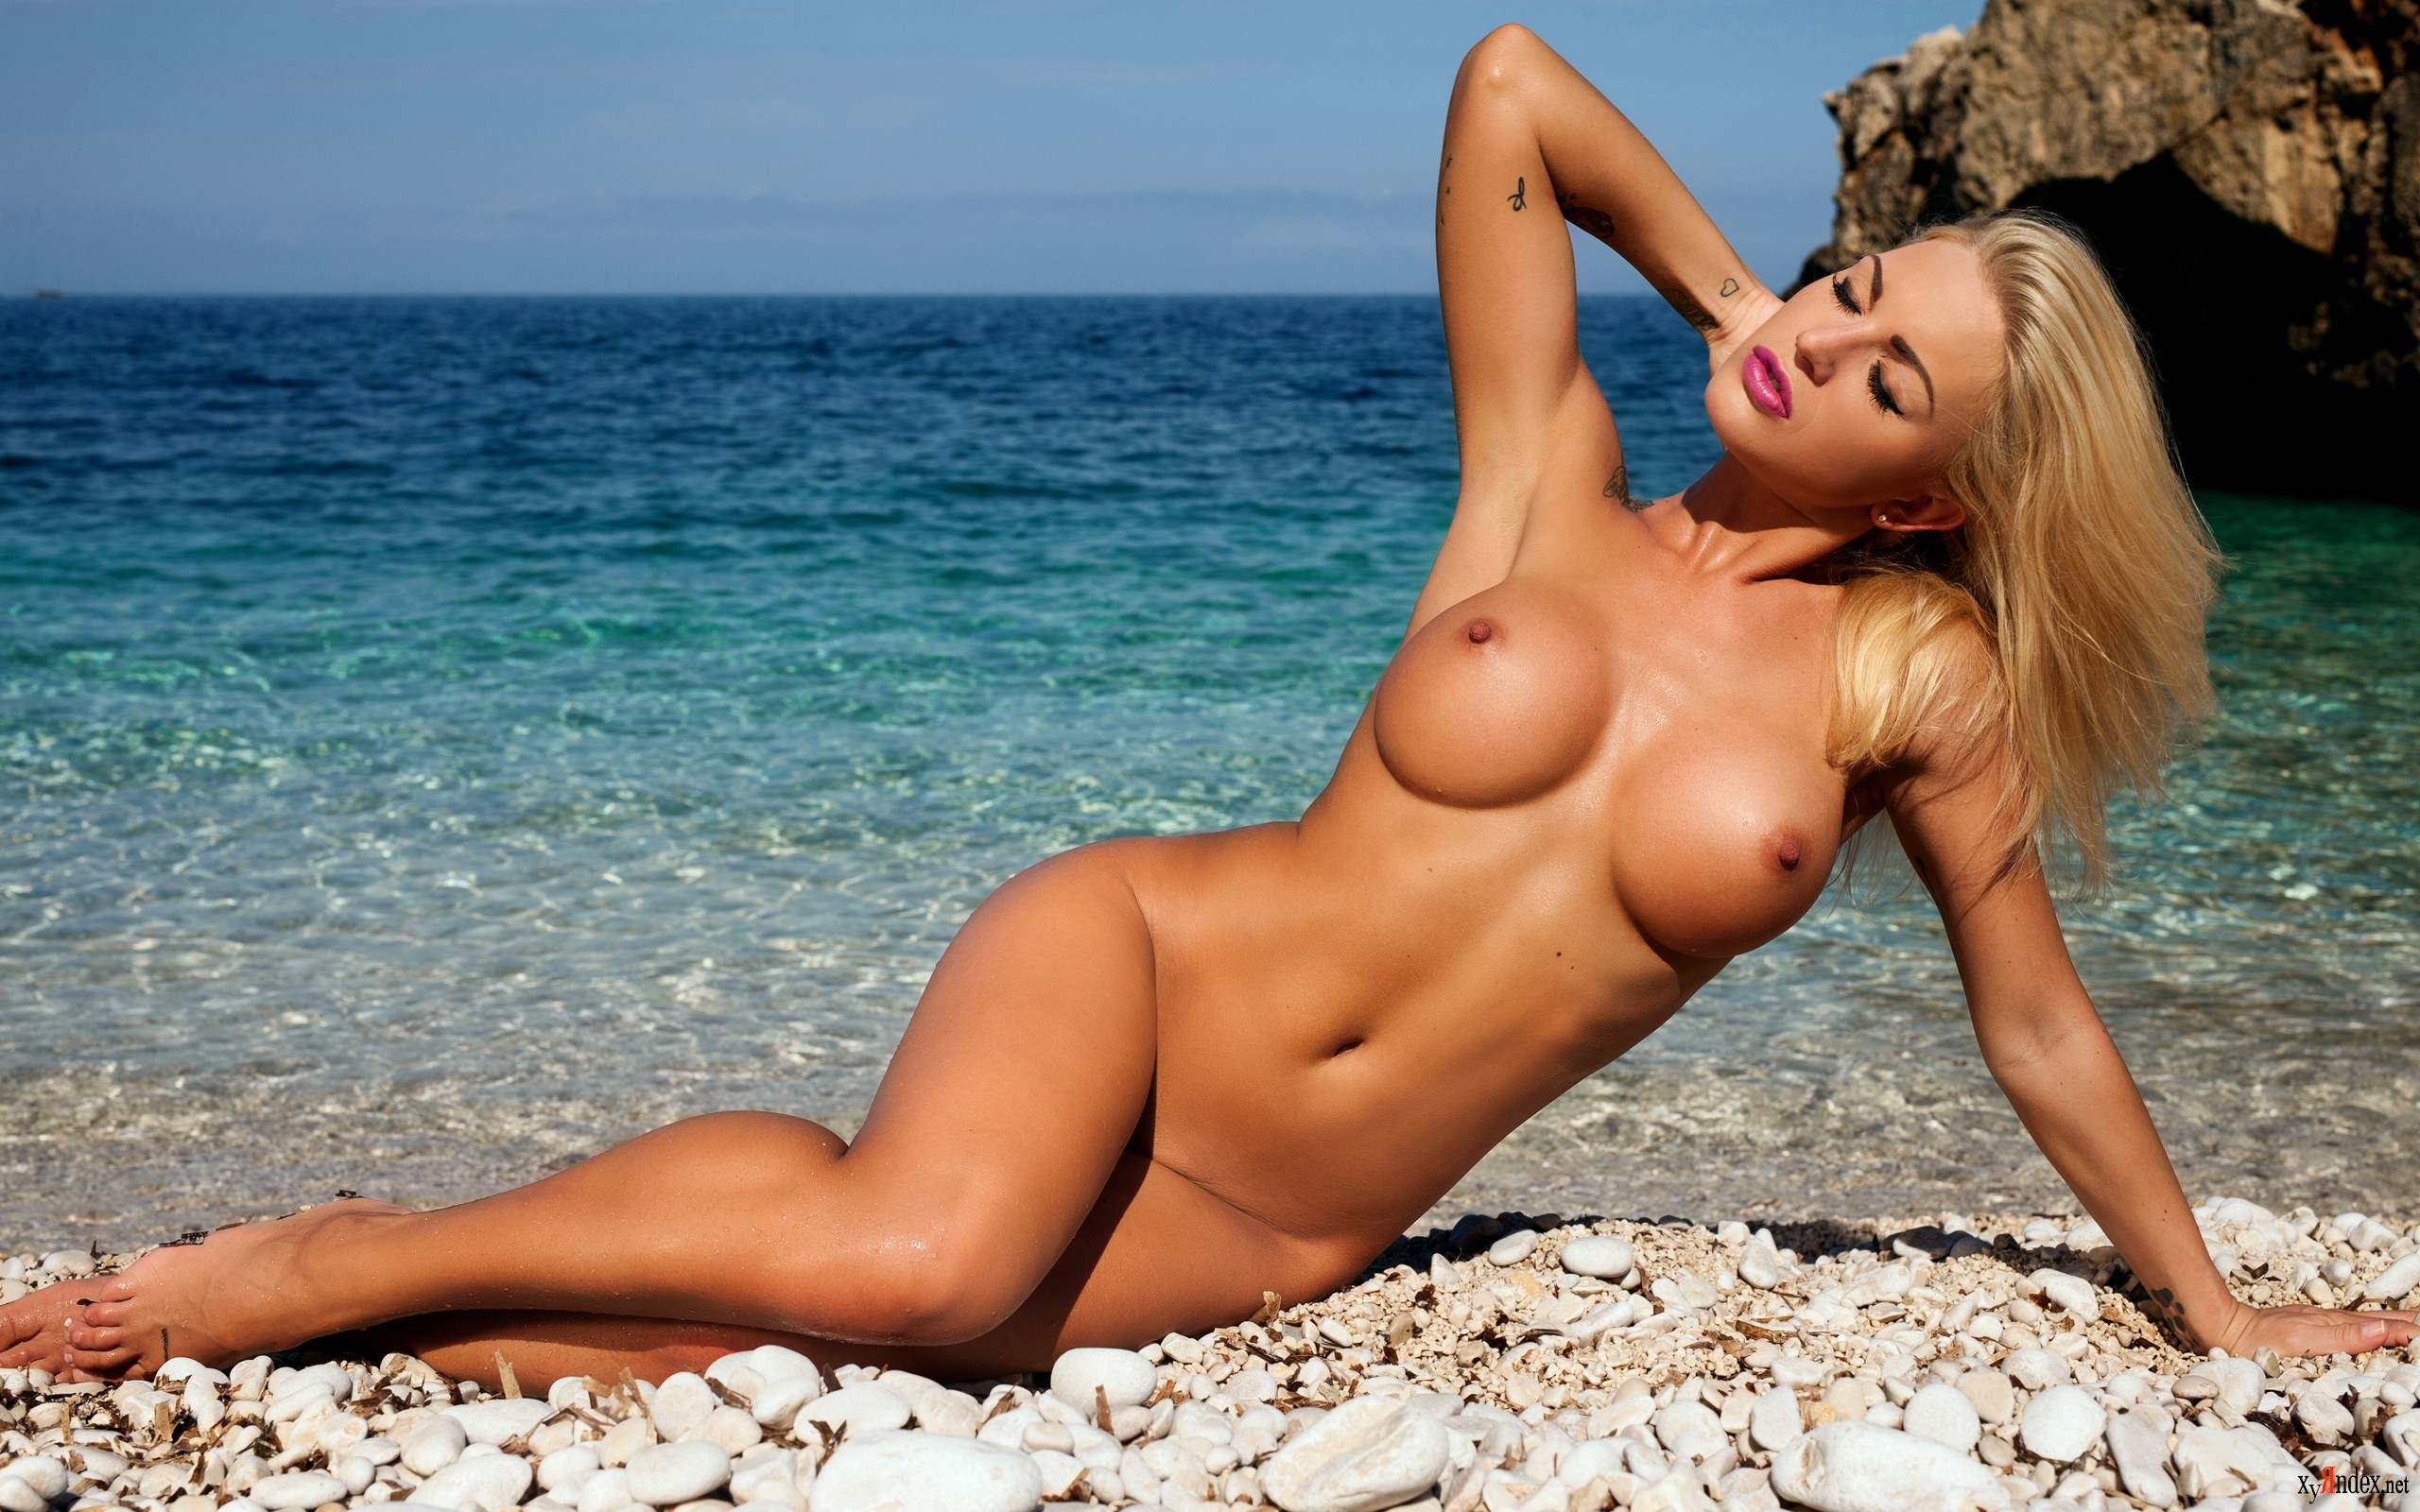 Видео эротика фото блондинка на пляже видео рыбалке